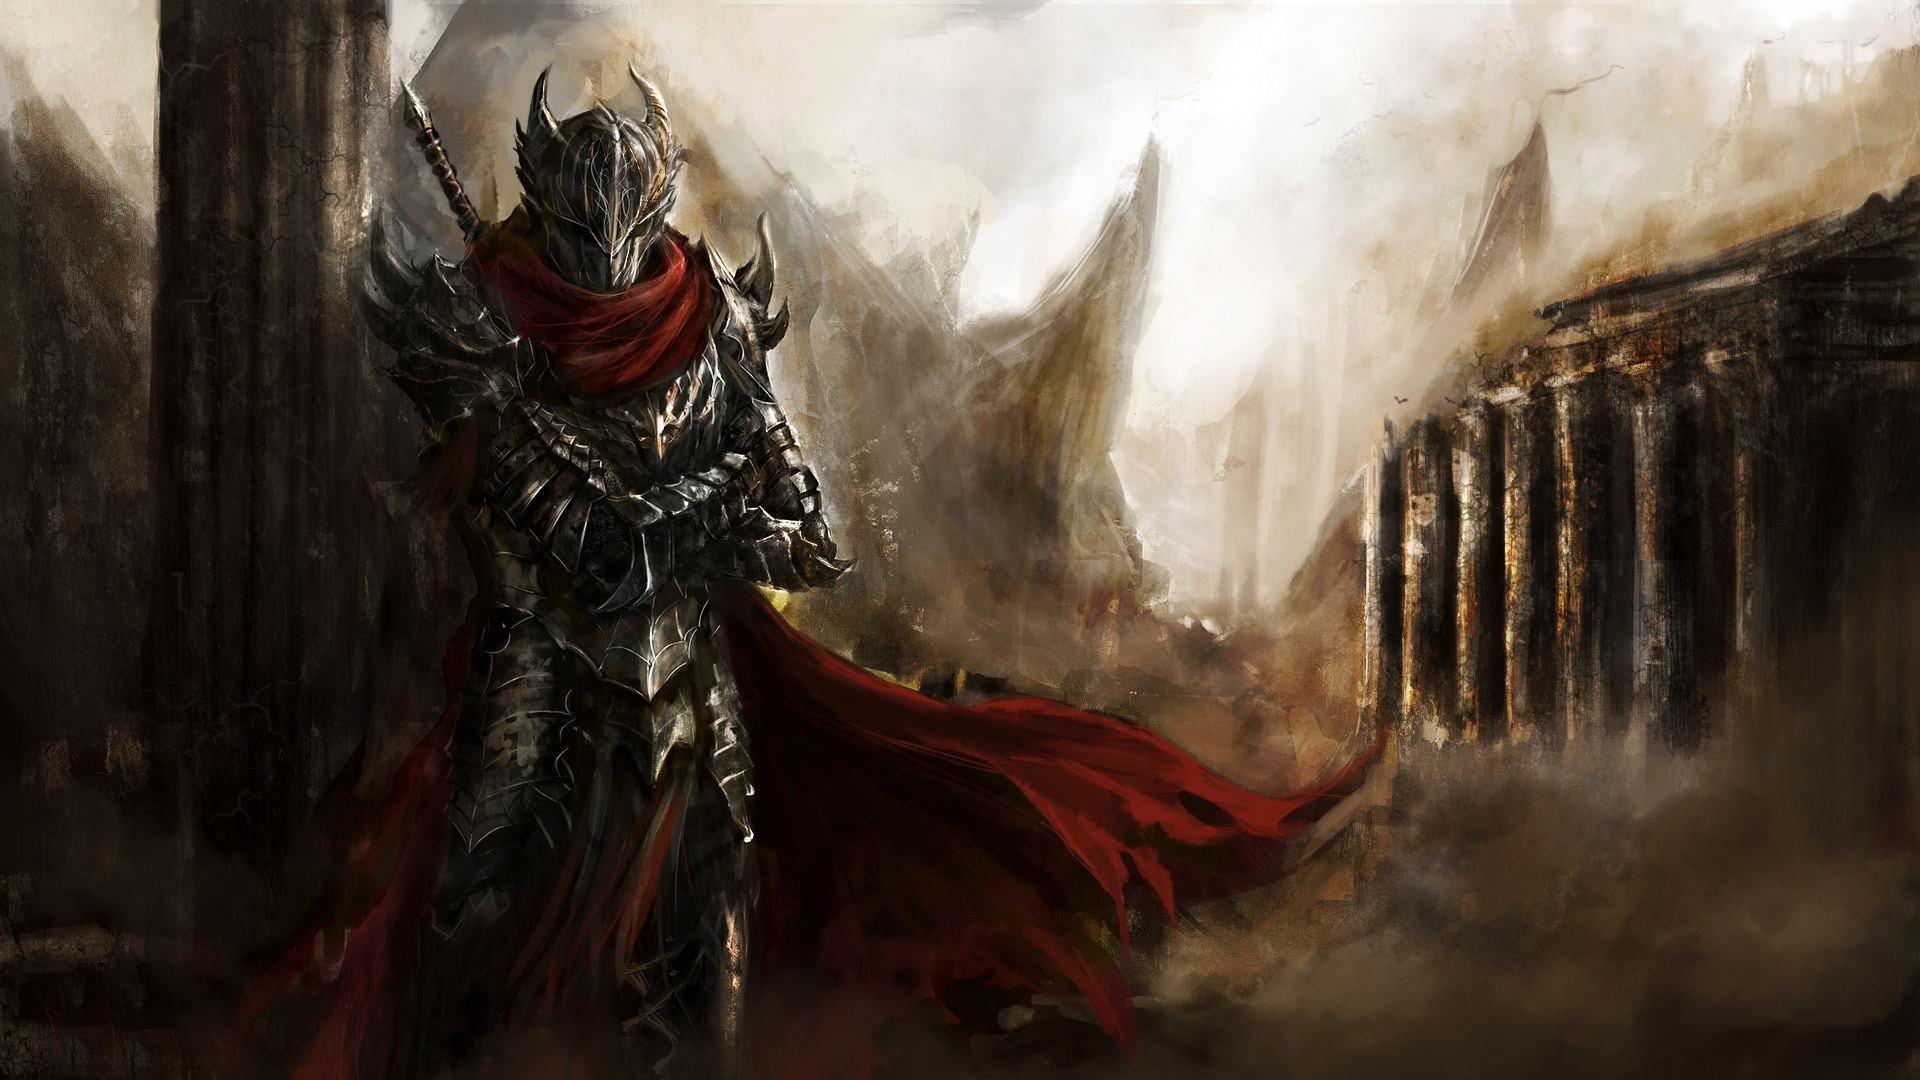 General 1920x1080 artwork fantasy art concept art knight medieval Guild Wars Guild Wars 2